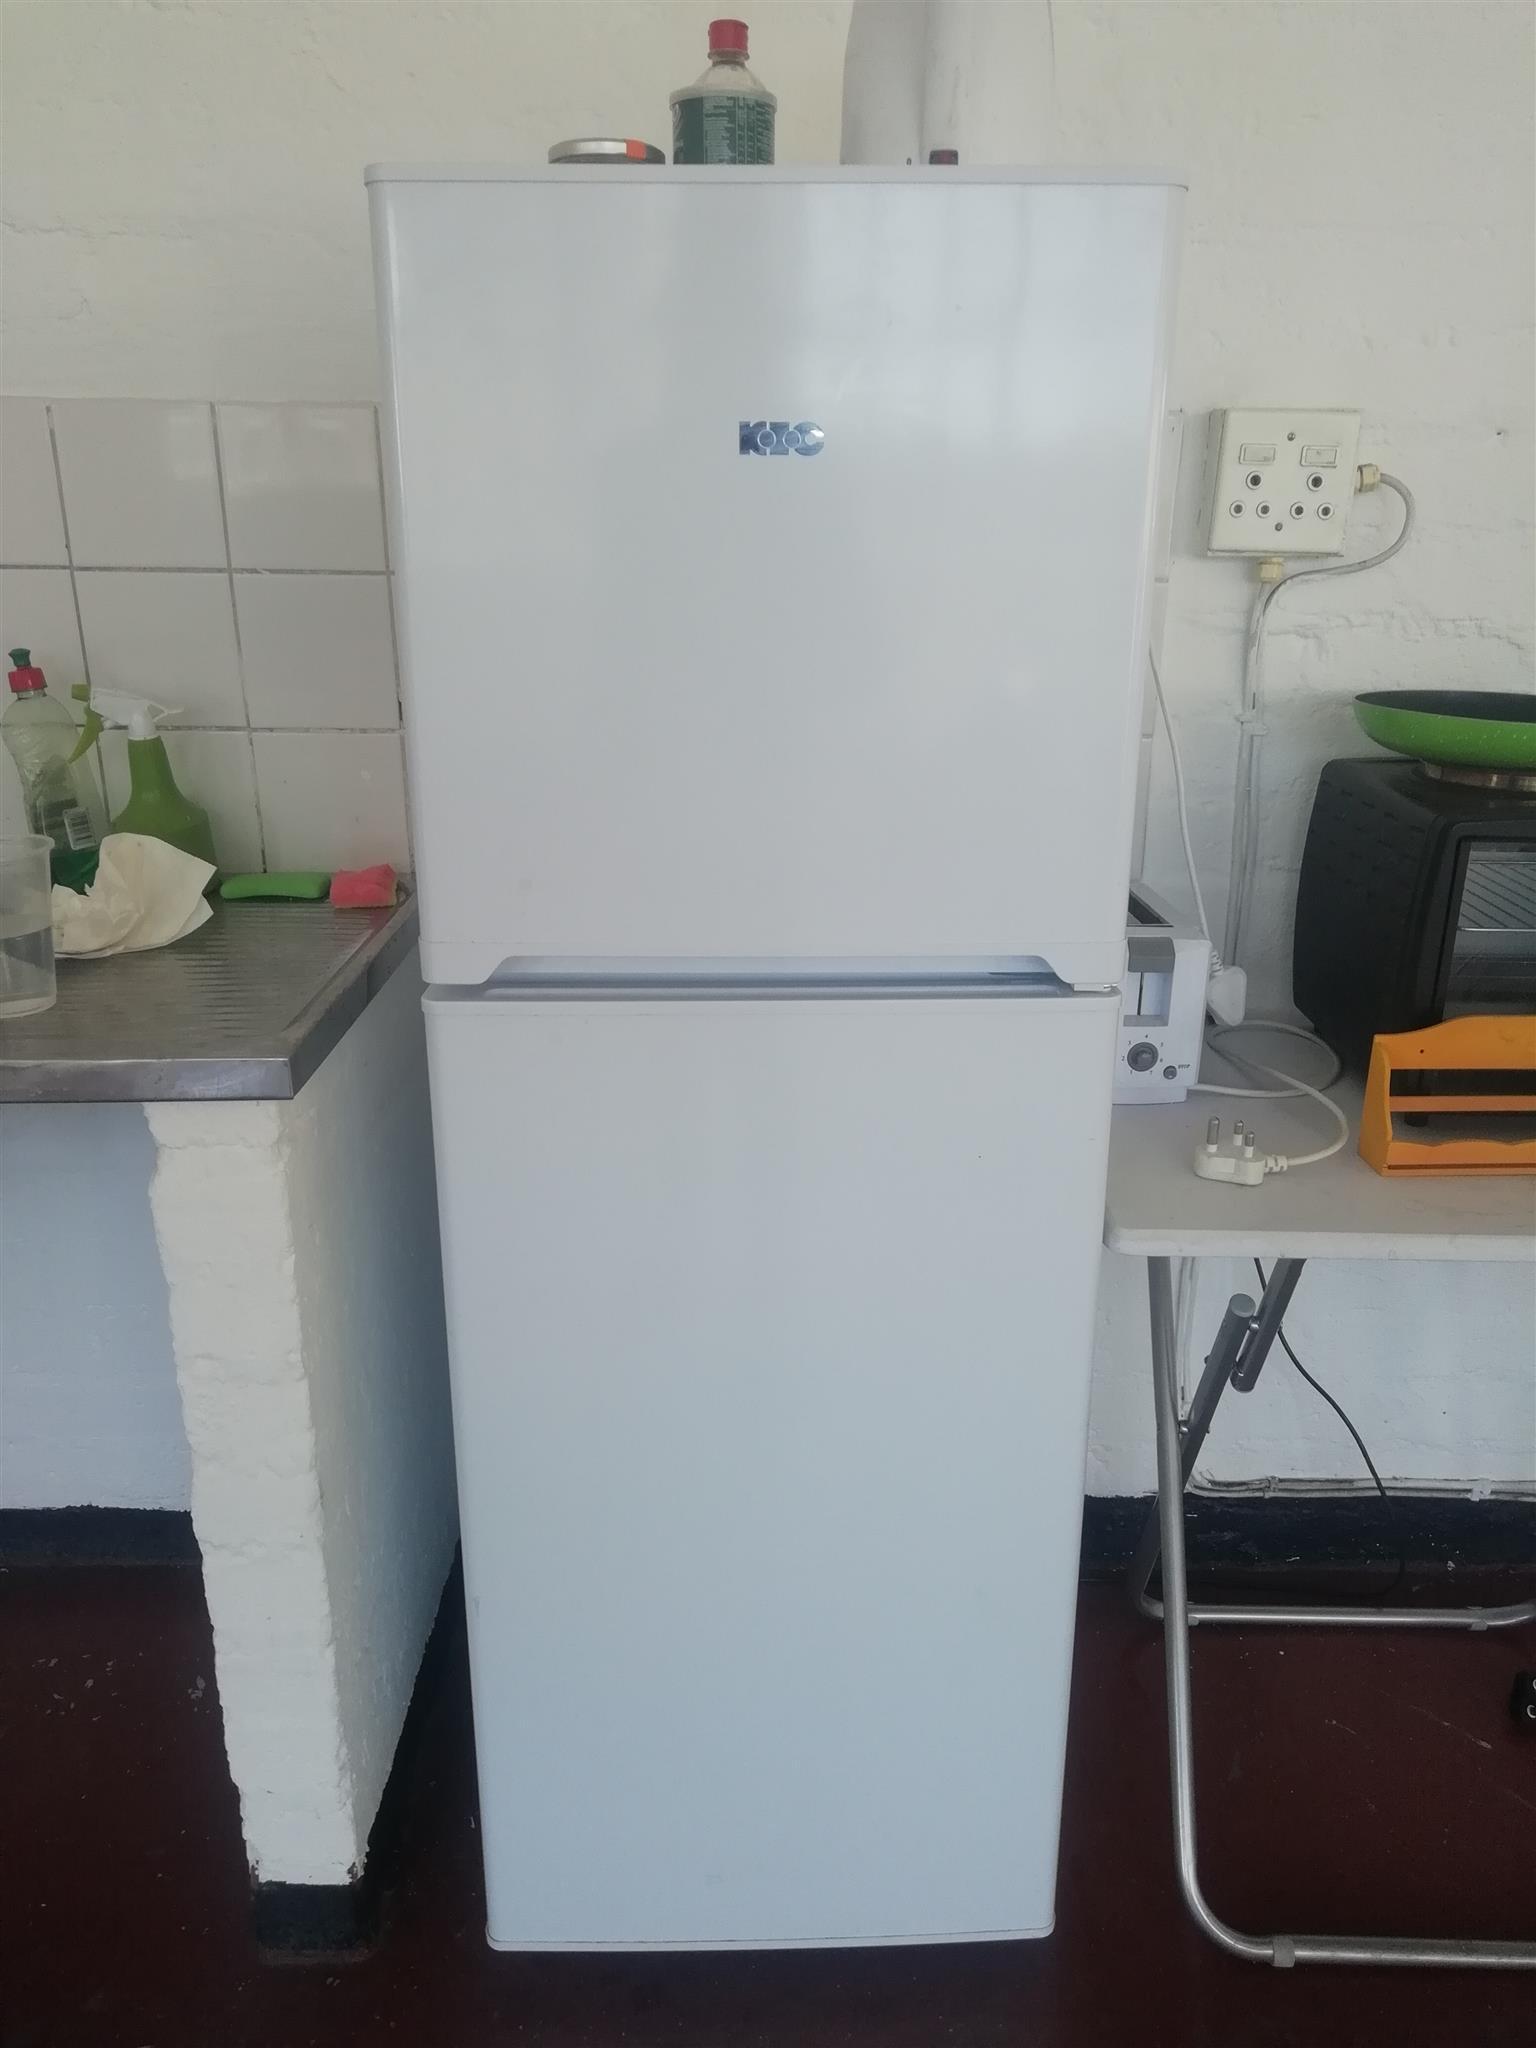 Cool KIC fridge for sale